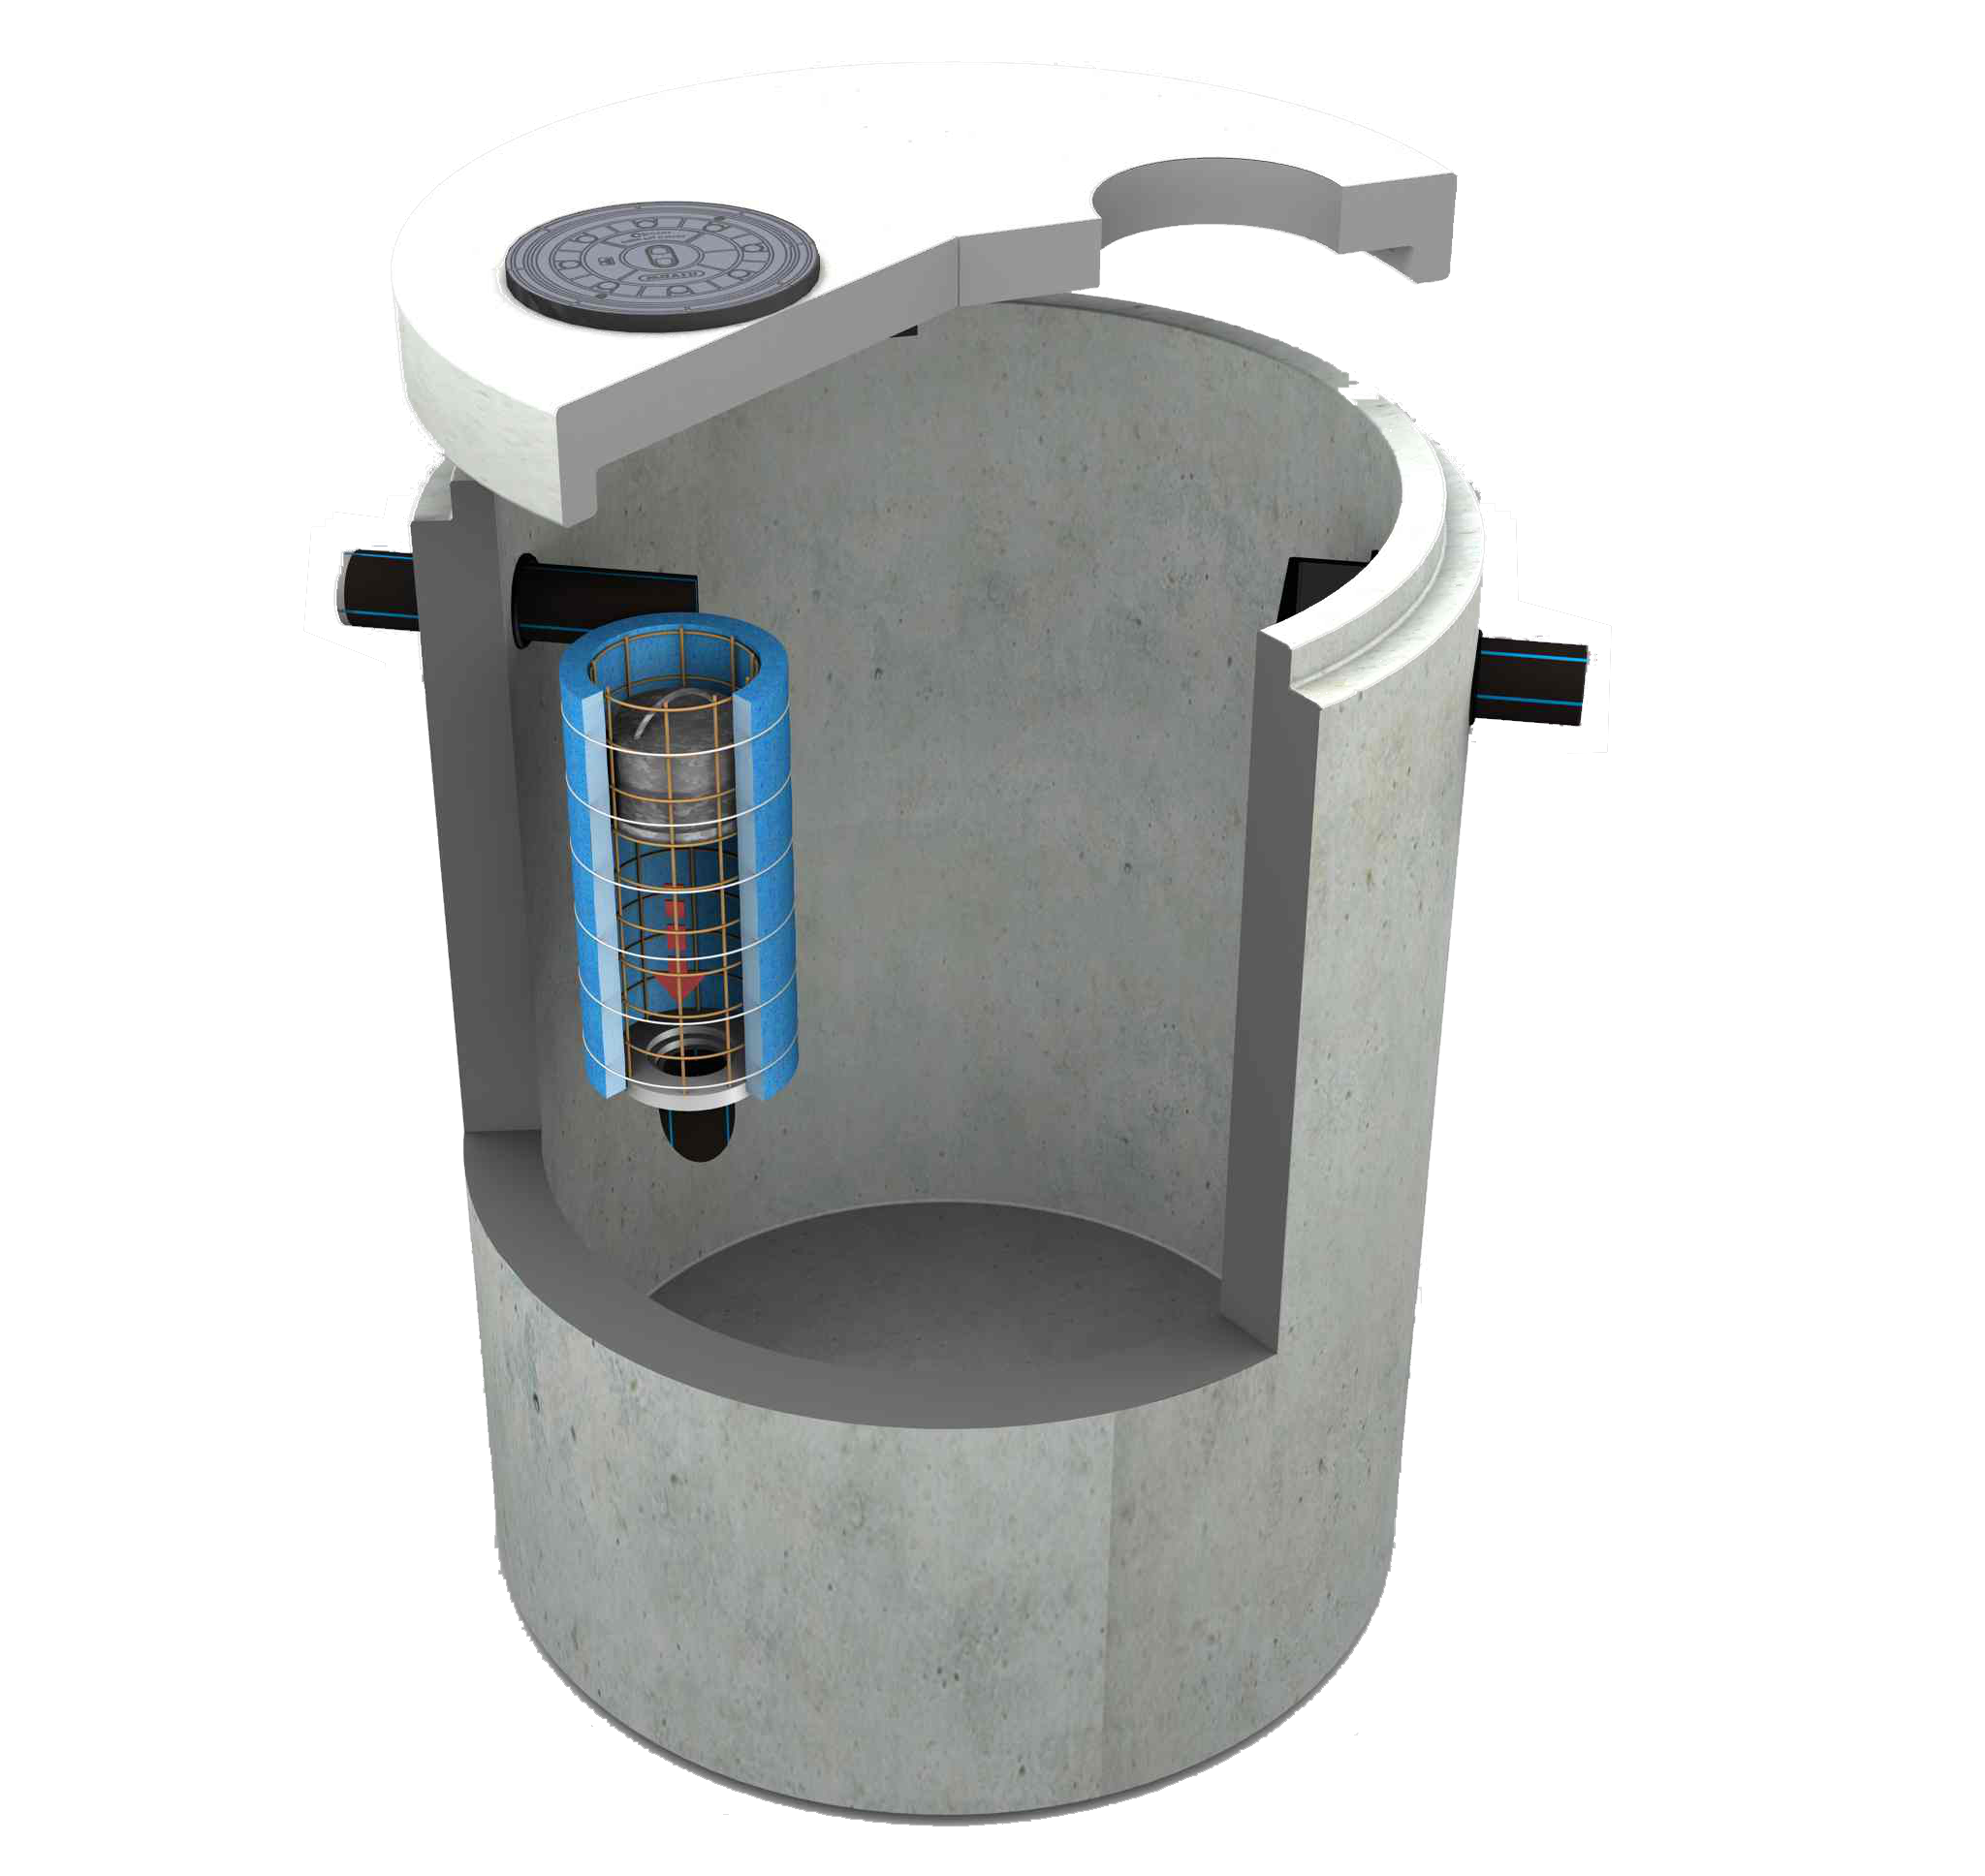 Separator substancji ropopochodnych